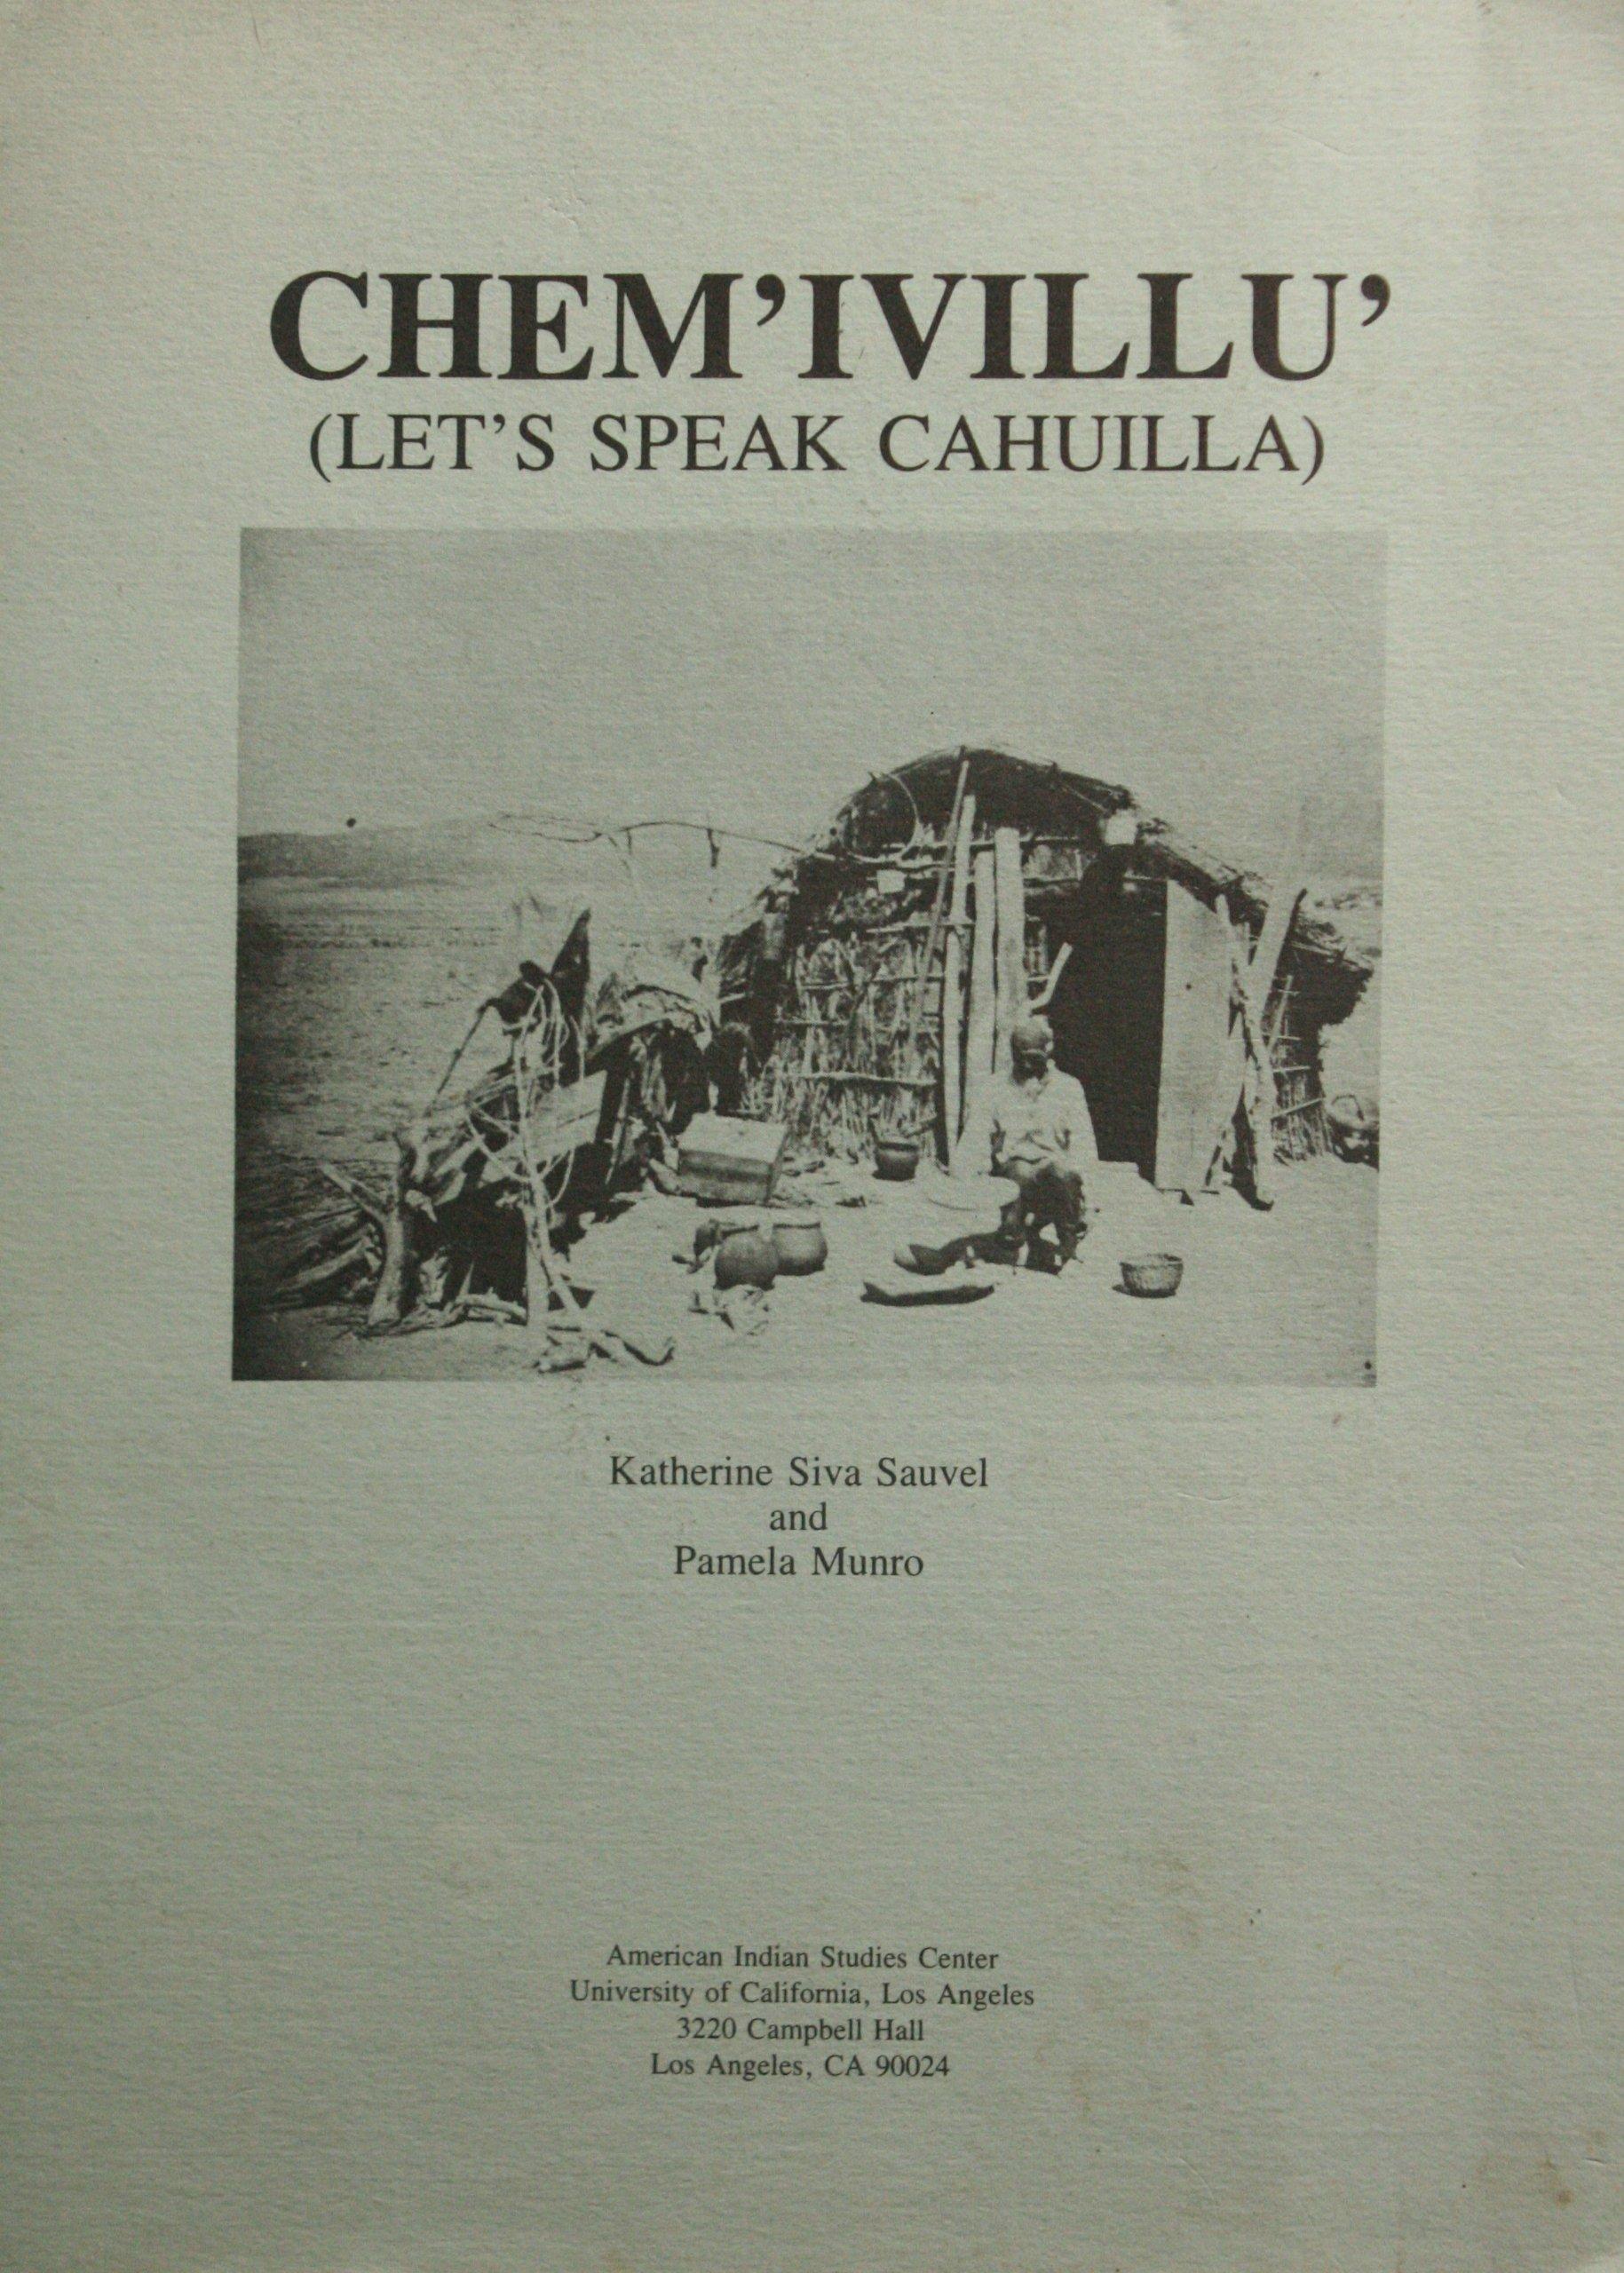 CHEM'IVILLU' (LET'S SPEAK CAHUILLA) - Our First Digital Download!